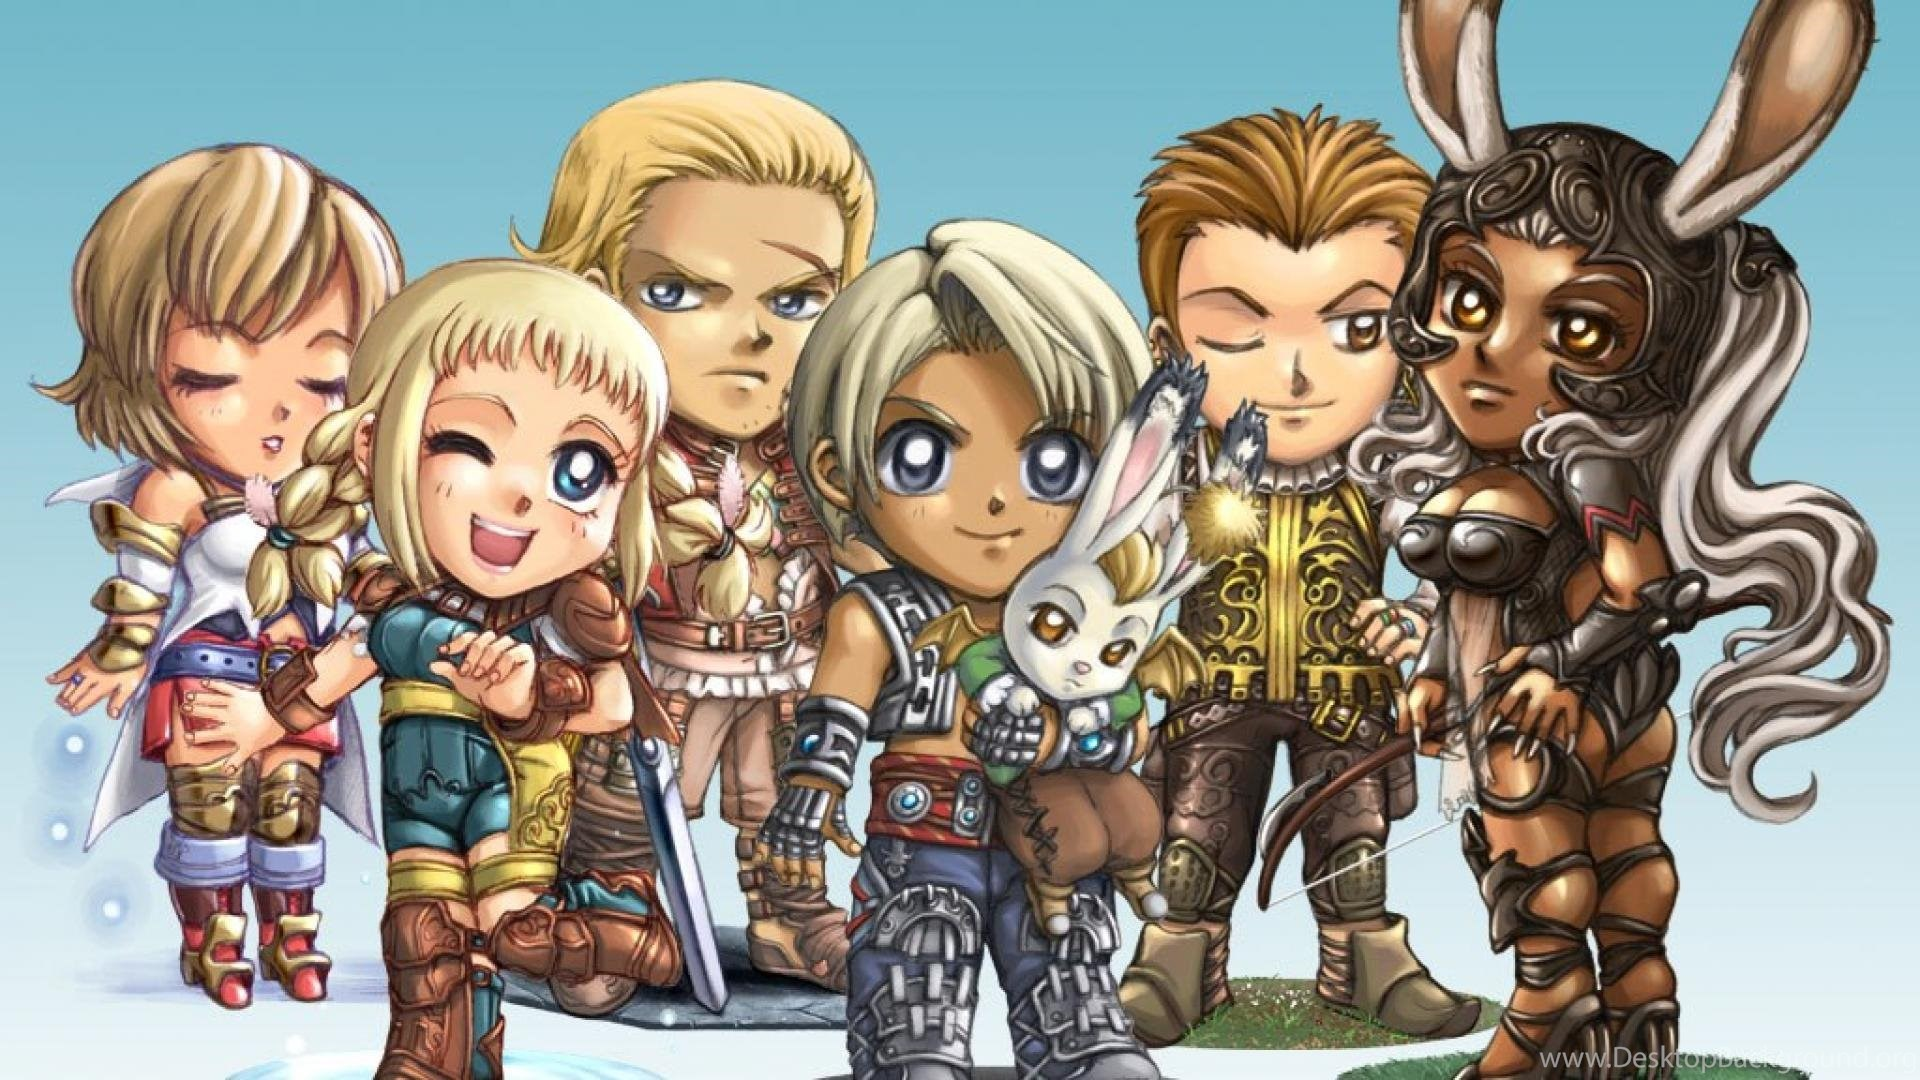 Video Games Final Fantasy Xii Hd Wallpapers Desktop Background